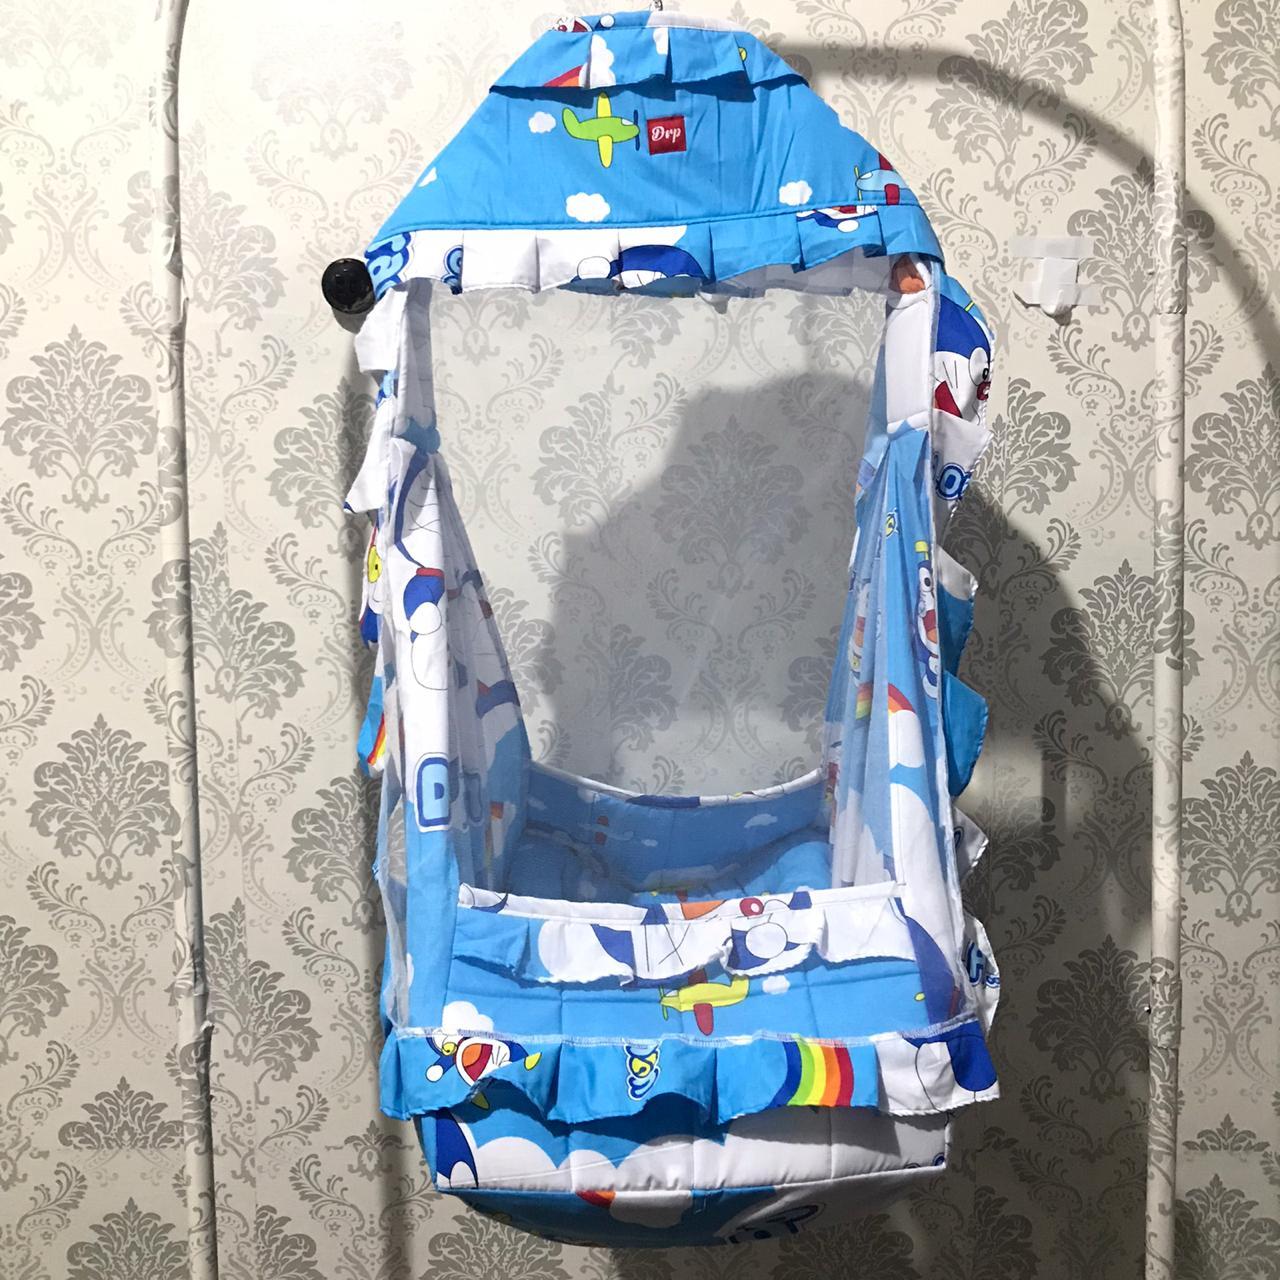 Jual Perlengkapan Berkendara Bayi | Lazada.co.id